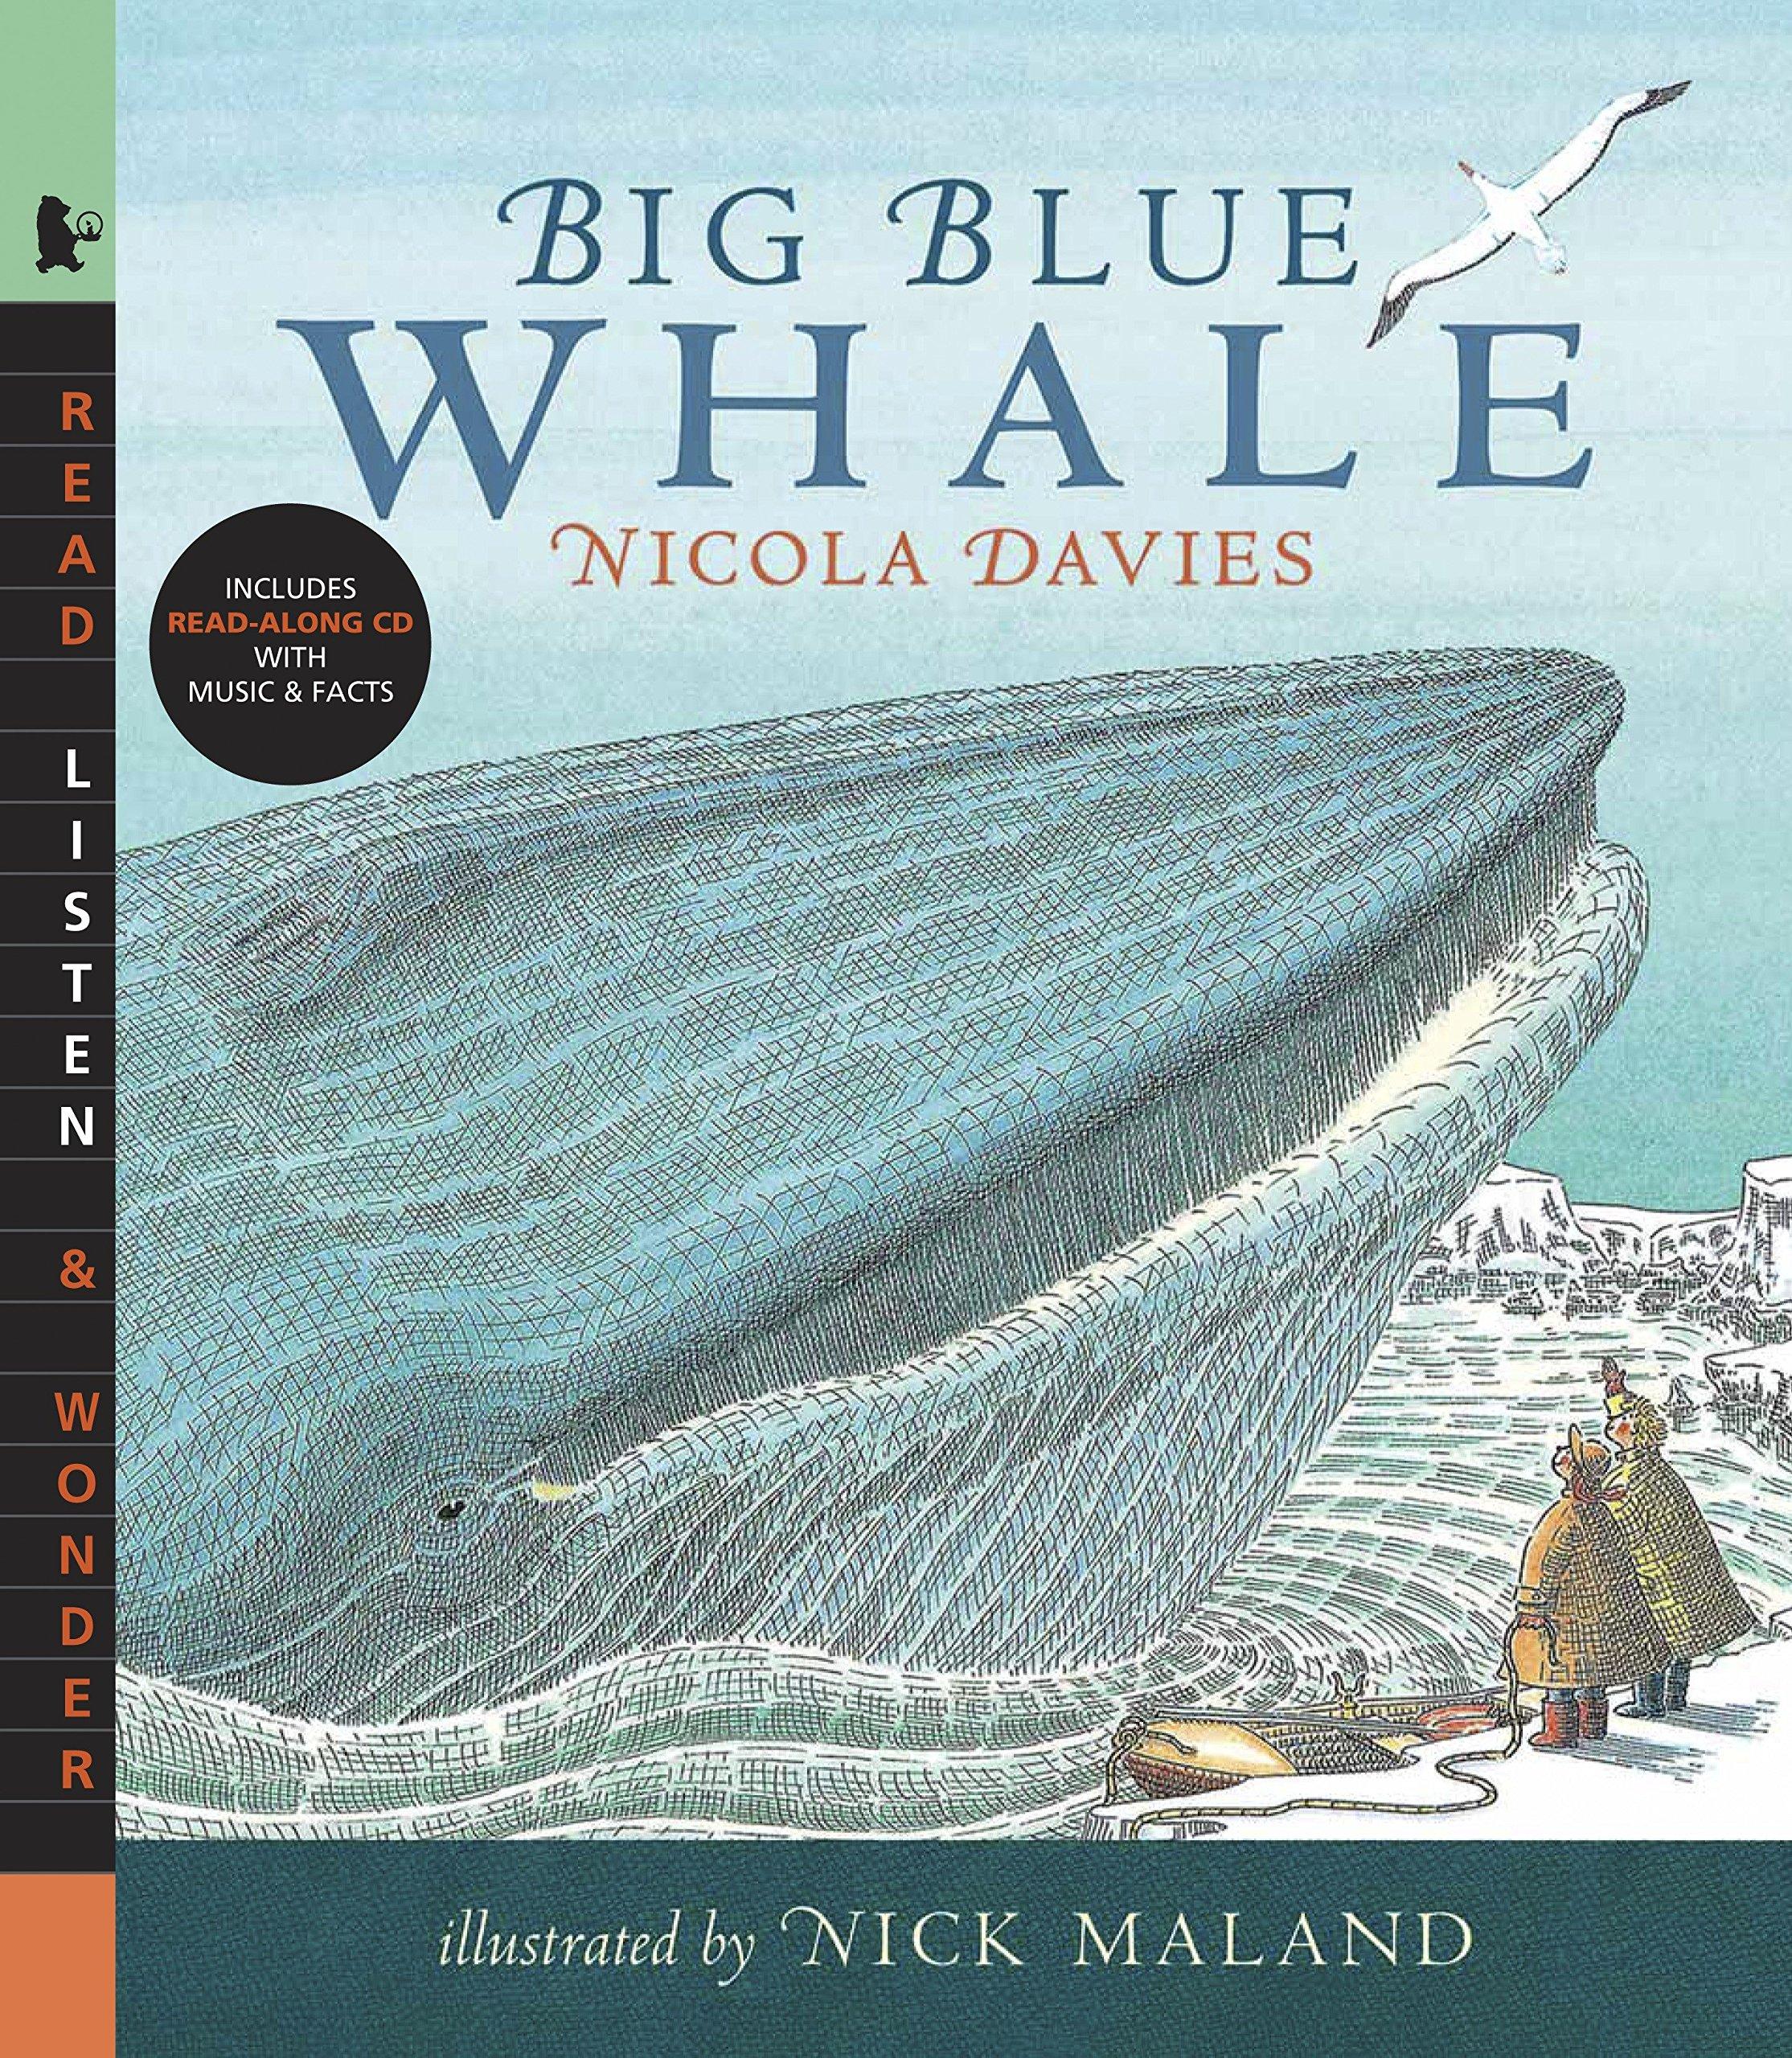 Big Blue Whale (Read, Listen, & Wonder): Amazon.co.uk: Davies, Nicola,  Maland, Nick: 9780763638221: Books